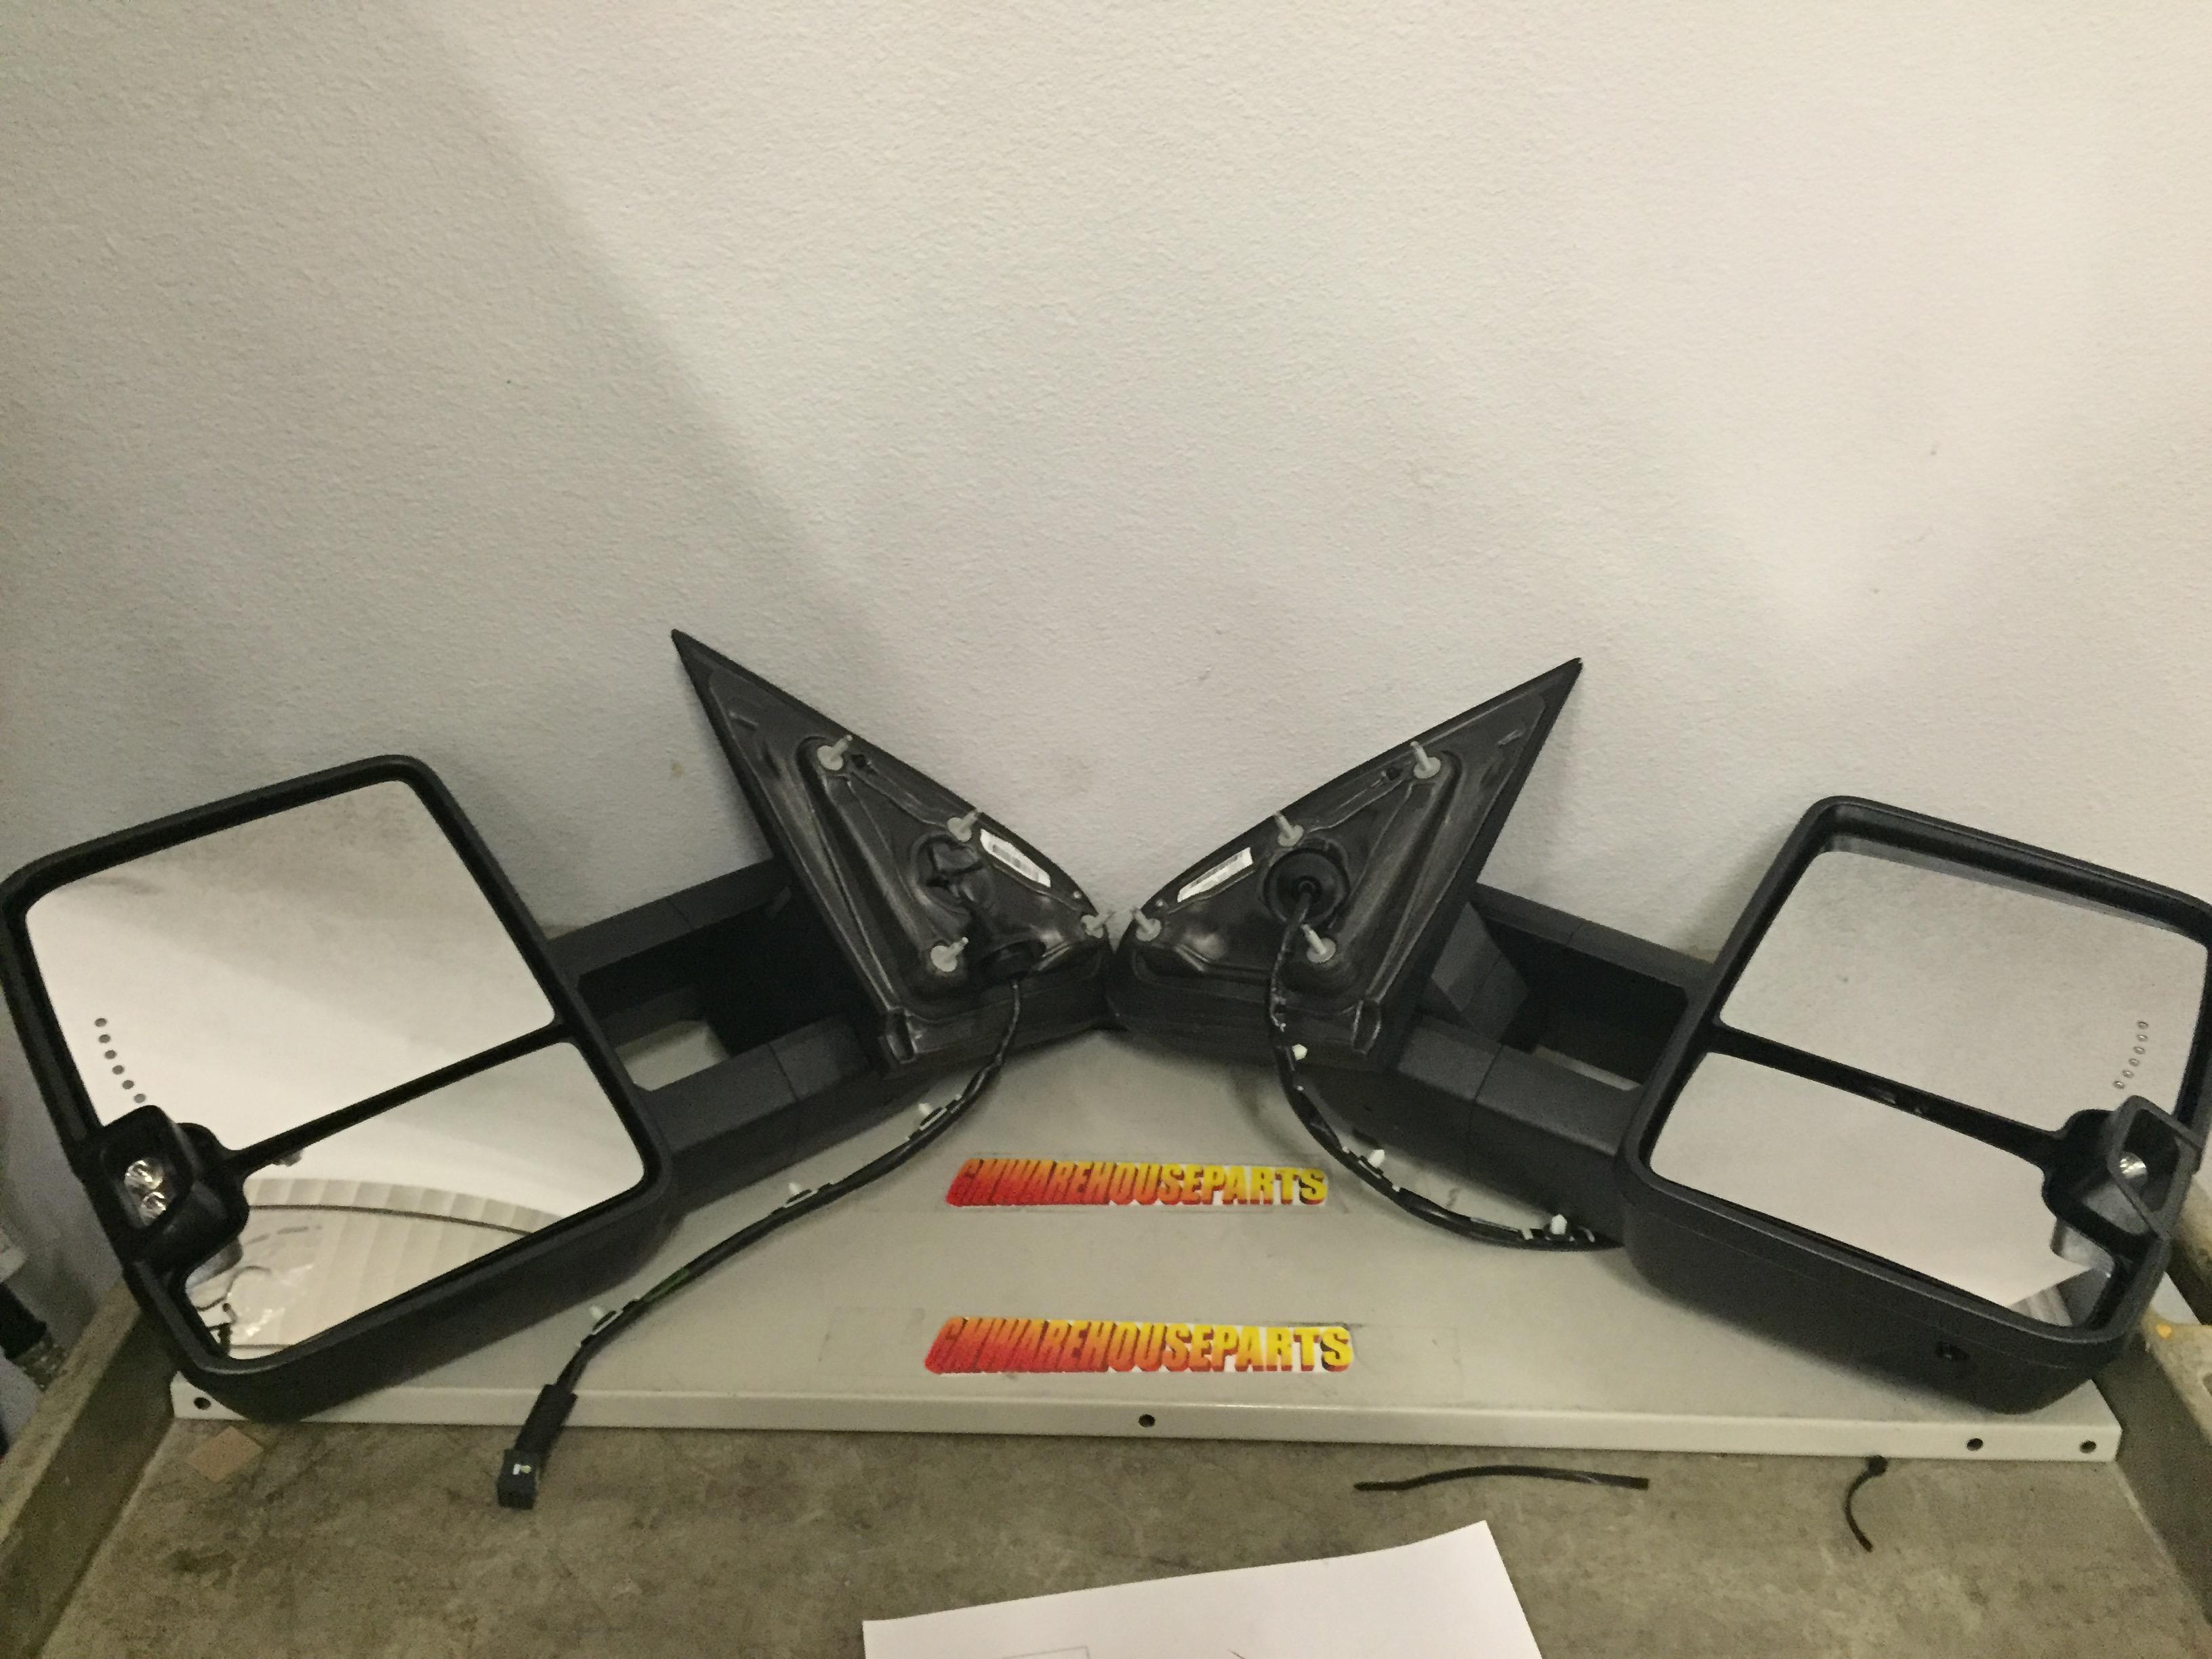 2015 2016 silverado sierra towing mirror kit camper mirror kitnew gm 23372182 ebay. Black Bedroom Furniture Sets. Home Design Ideas